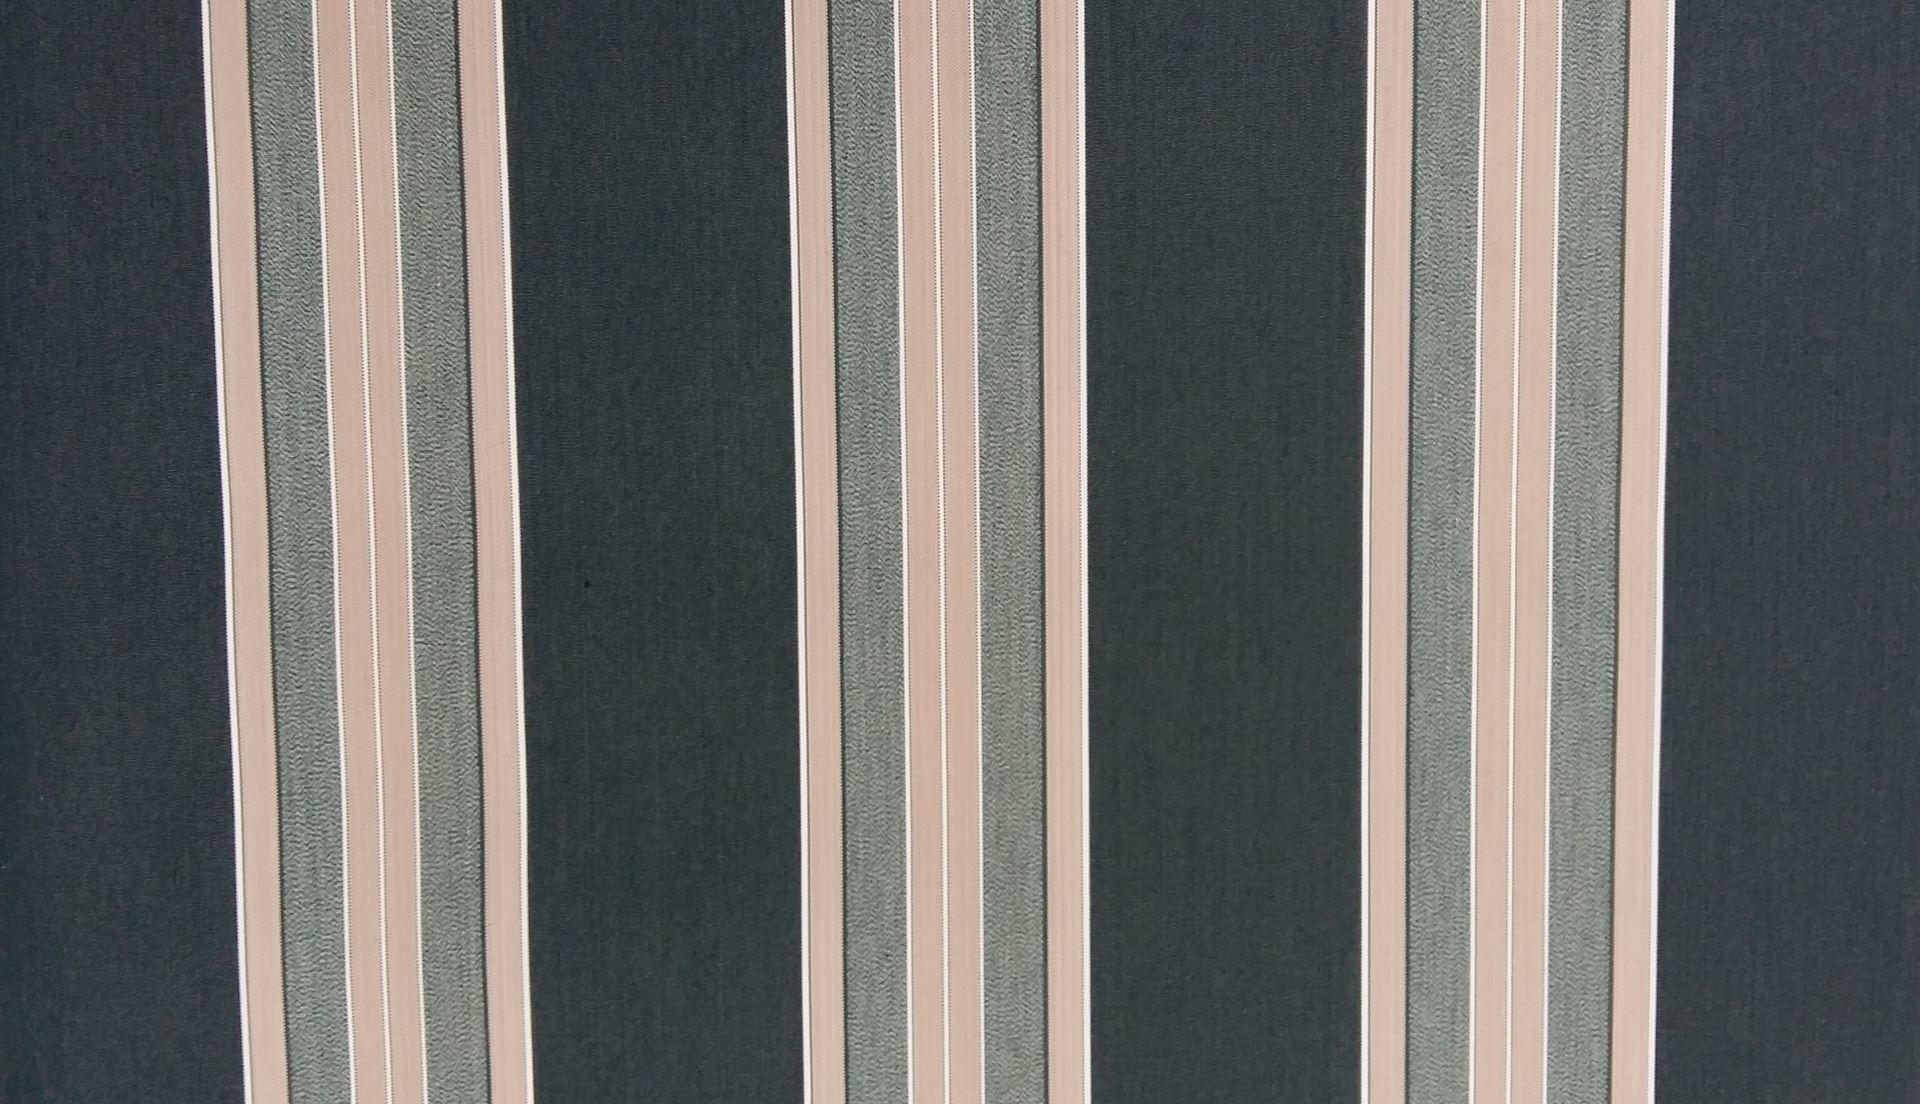 Rollersur toldo vertical tela lona acrilica rayada for Recambios de telas para toldos